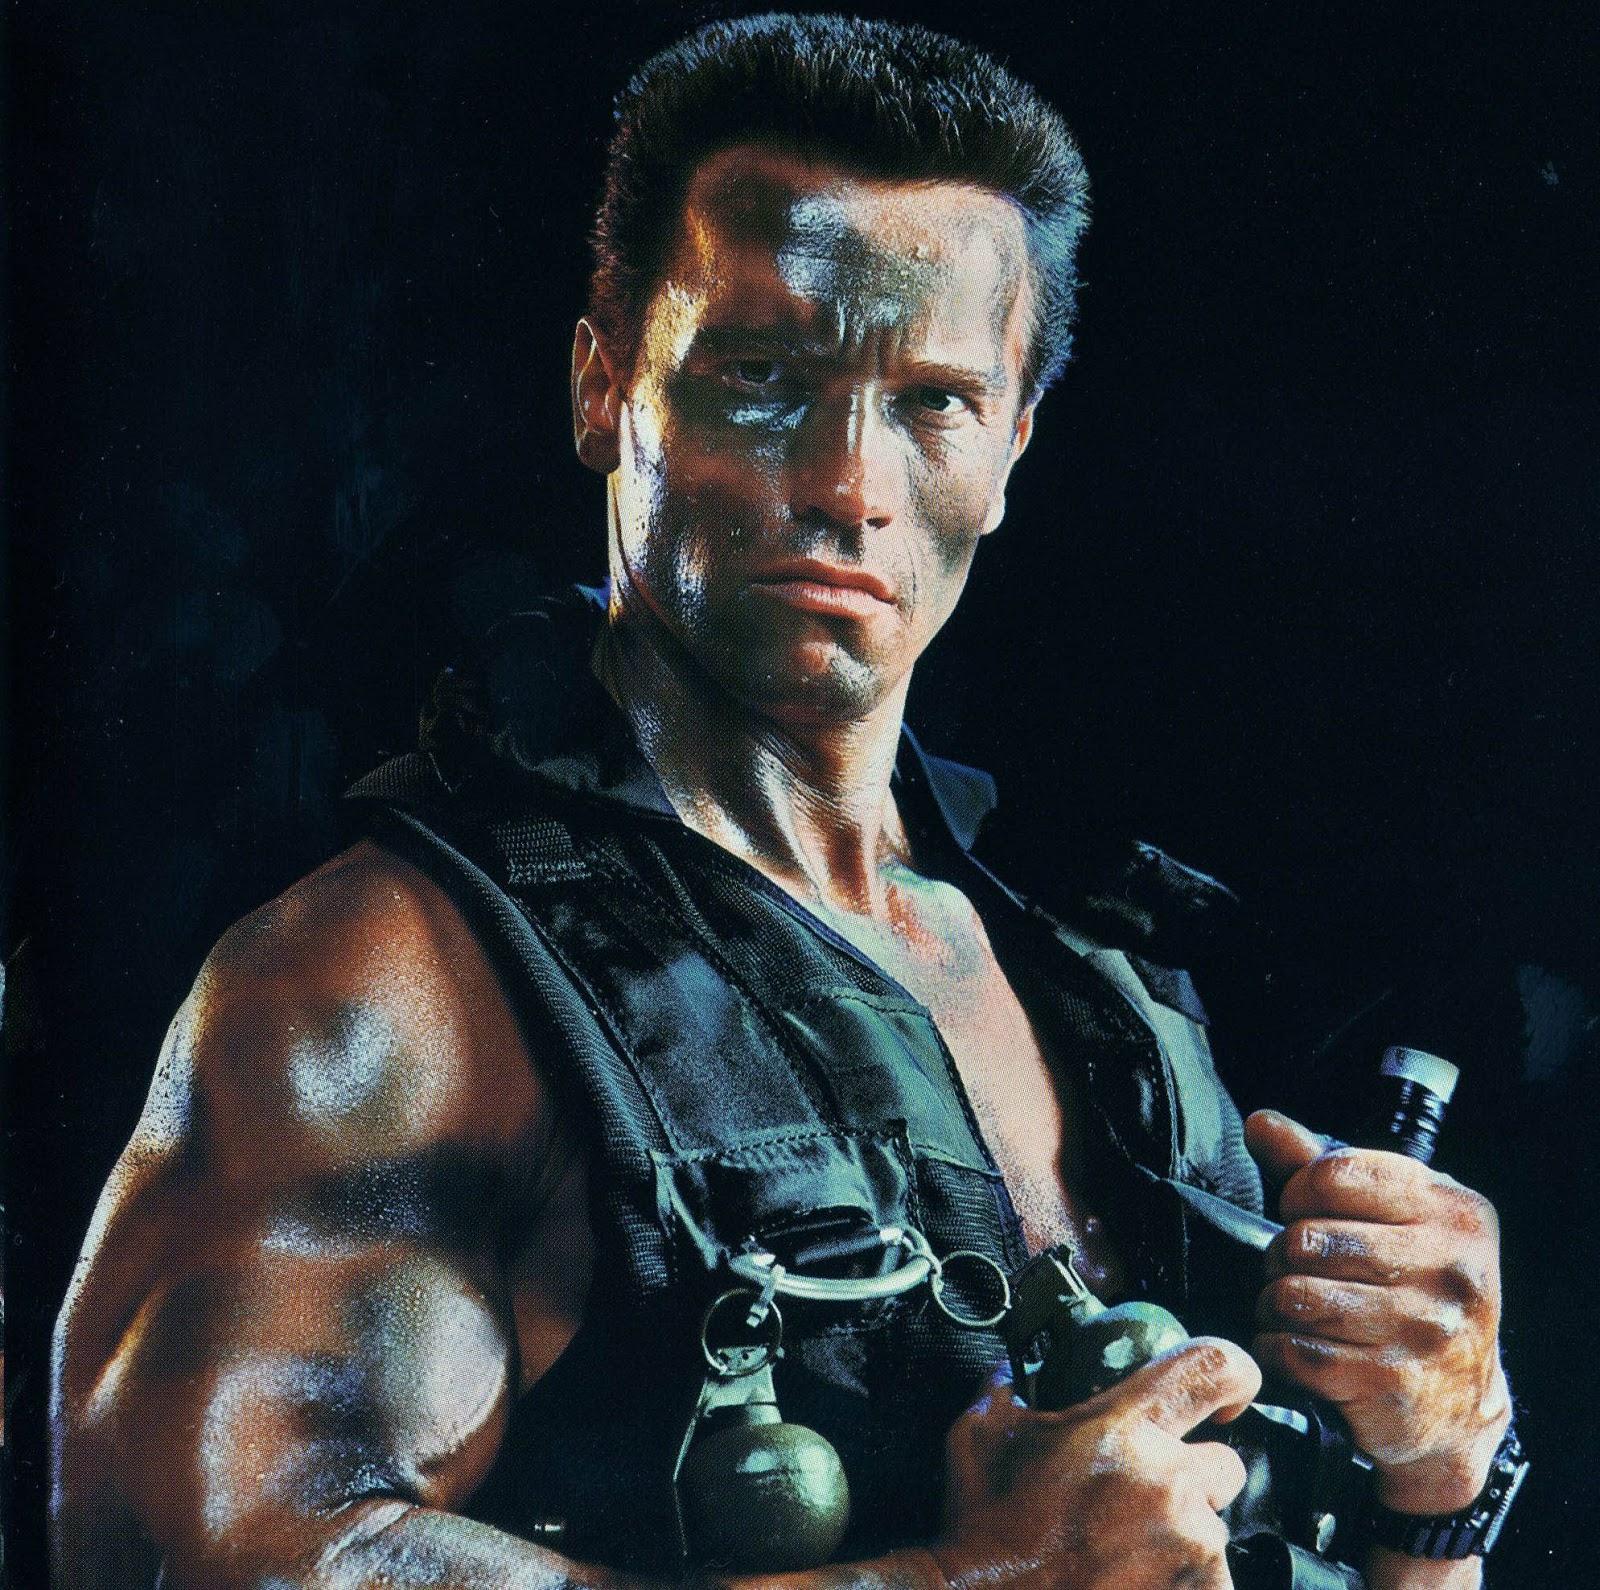 http://3.bp.blogspot.com/-YPenXPvtE1Q/TyGaZo00HoI/AAAAAAAAIuc/wBCMHCJQWFU/s1600/Arnold+Schwarzenegger+21.jpg